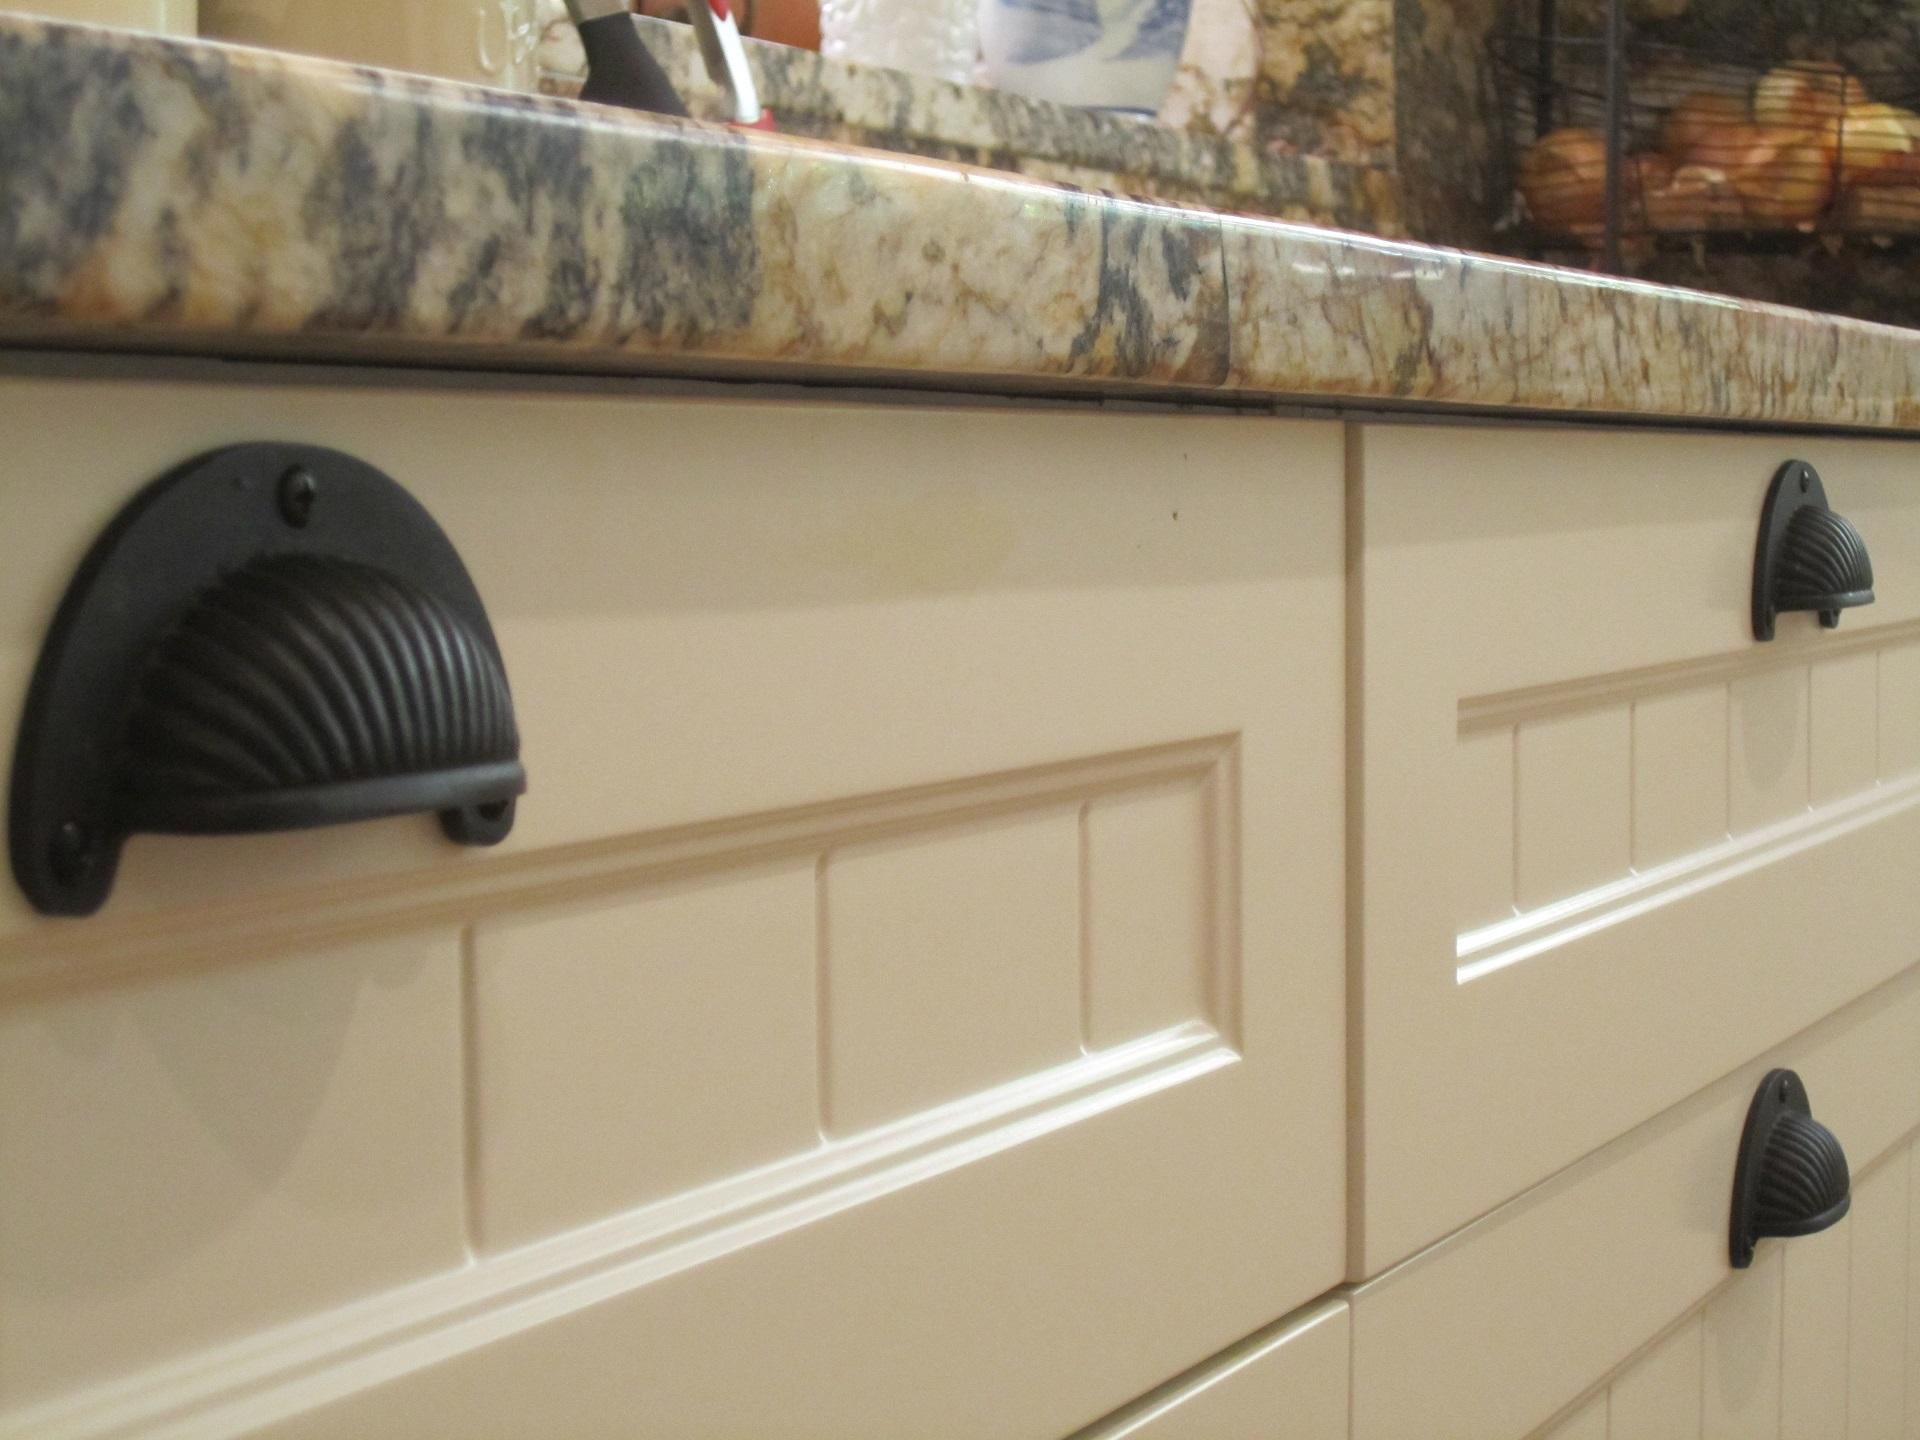 Brisbane Kitchen Design Samford  Traditional Kitchen Renovation White 2 Pac Shaker Door with VJ (8)